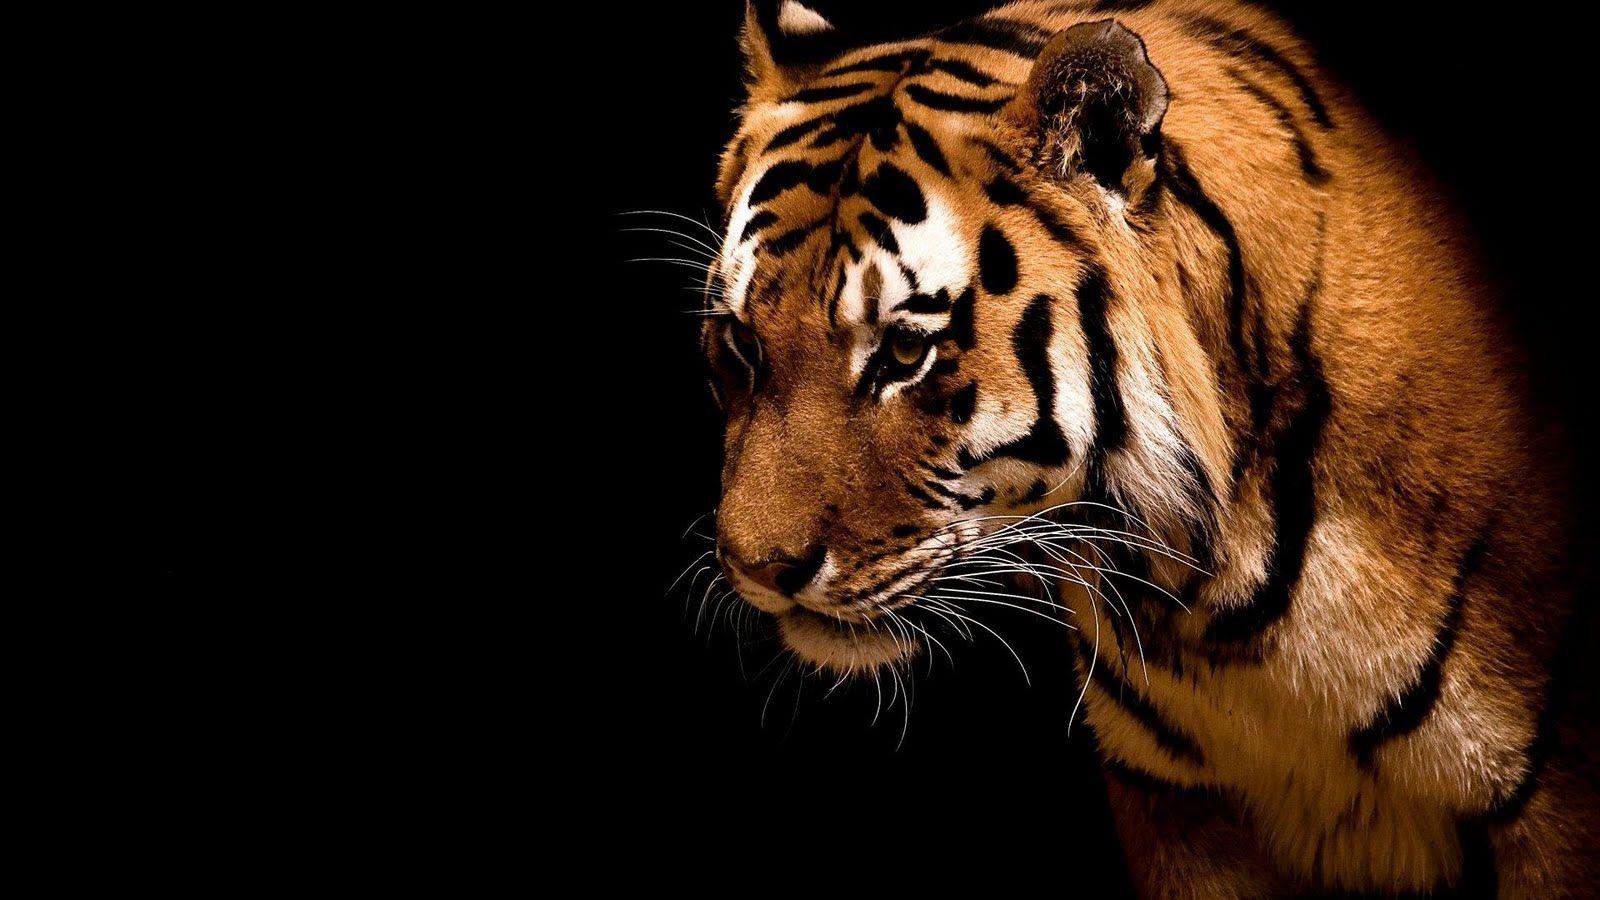 Majestic Tiger On Black Background